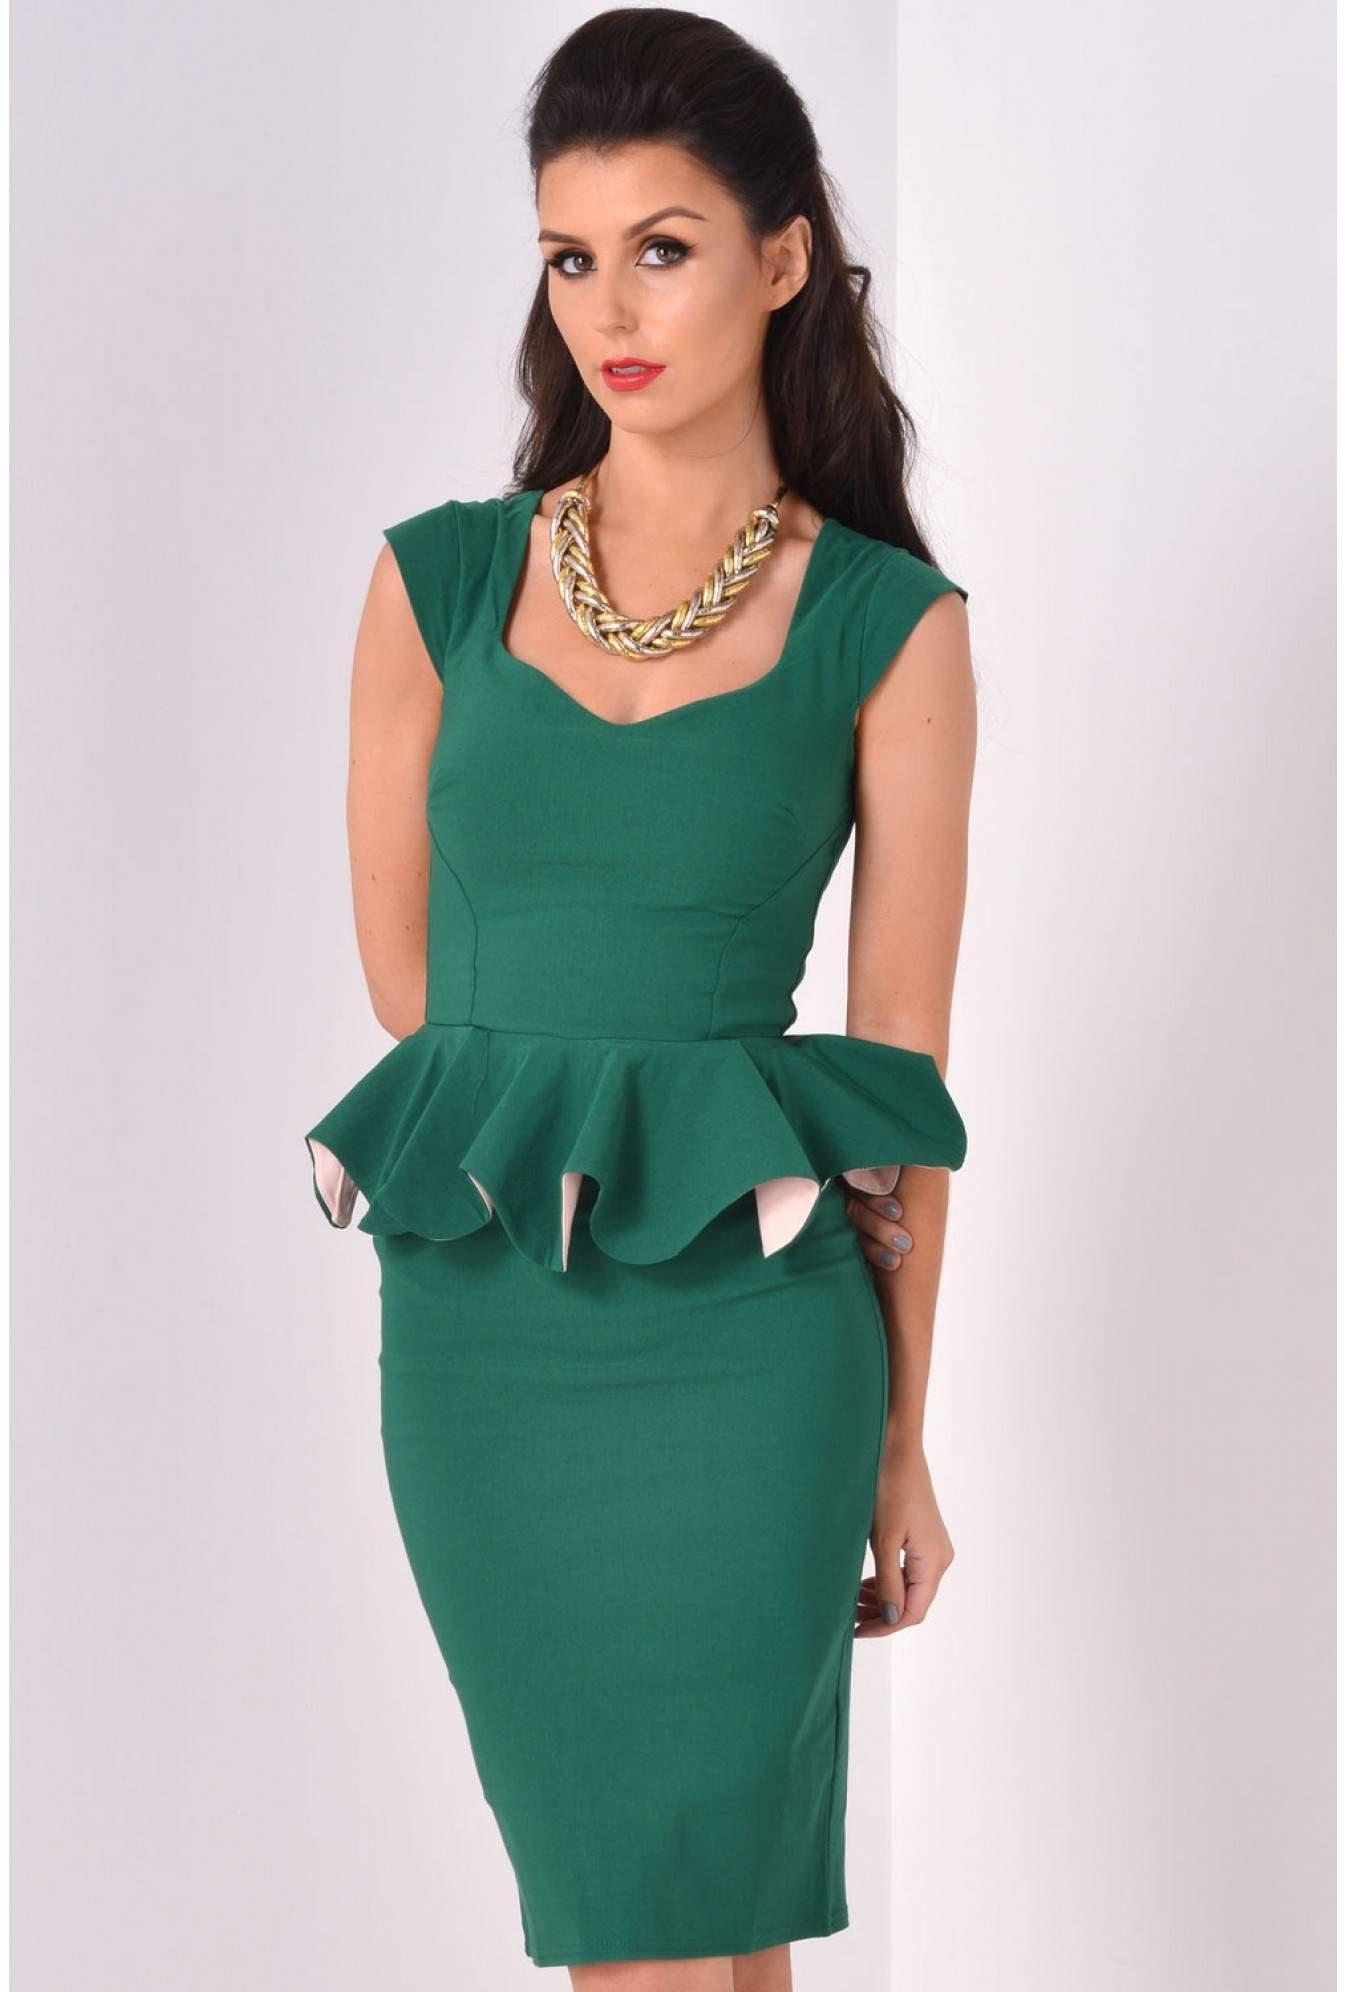 26770f3c09f Linda Frill Peplum Pencil Dress in Emerald